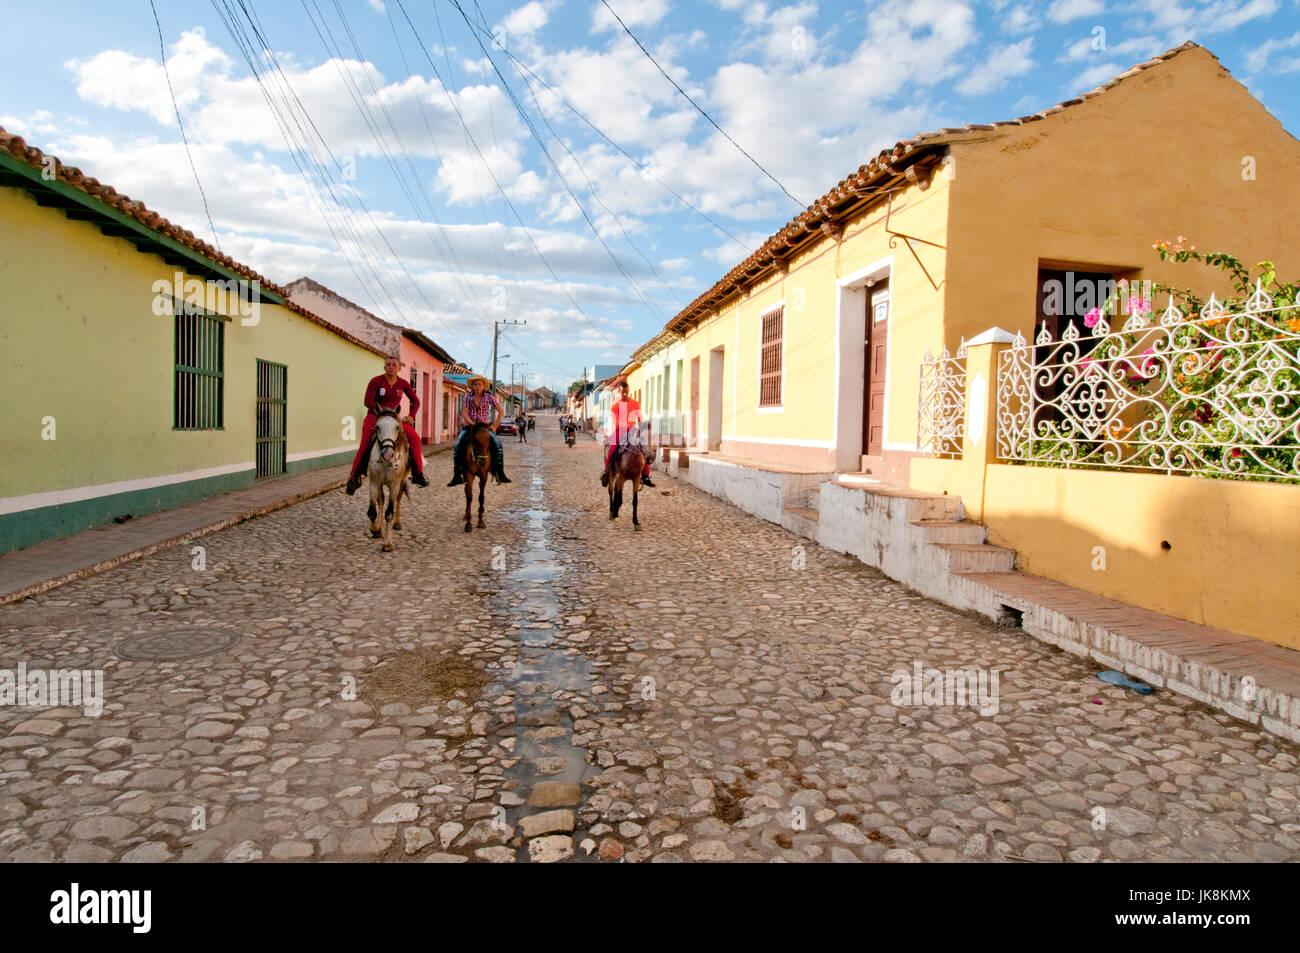 Boys riding horses down cobblestone street in Trinidad Cuba - Stock Image